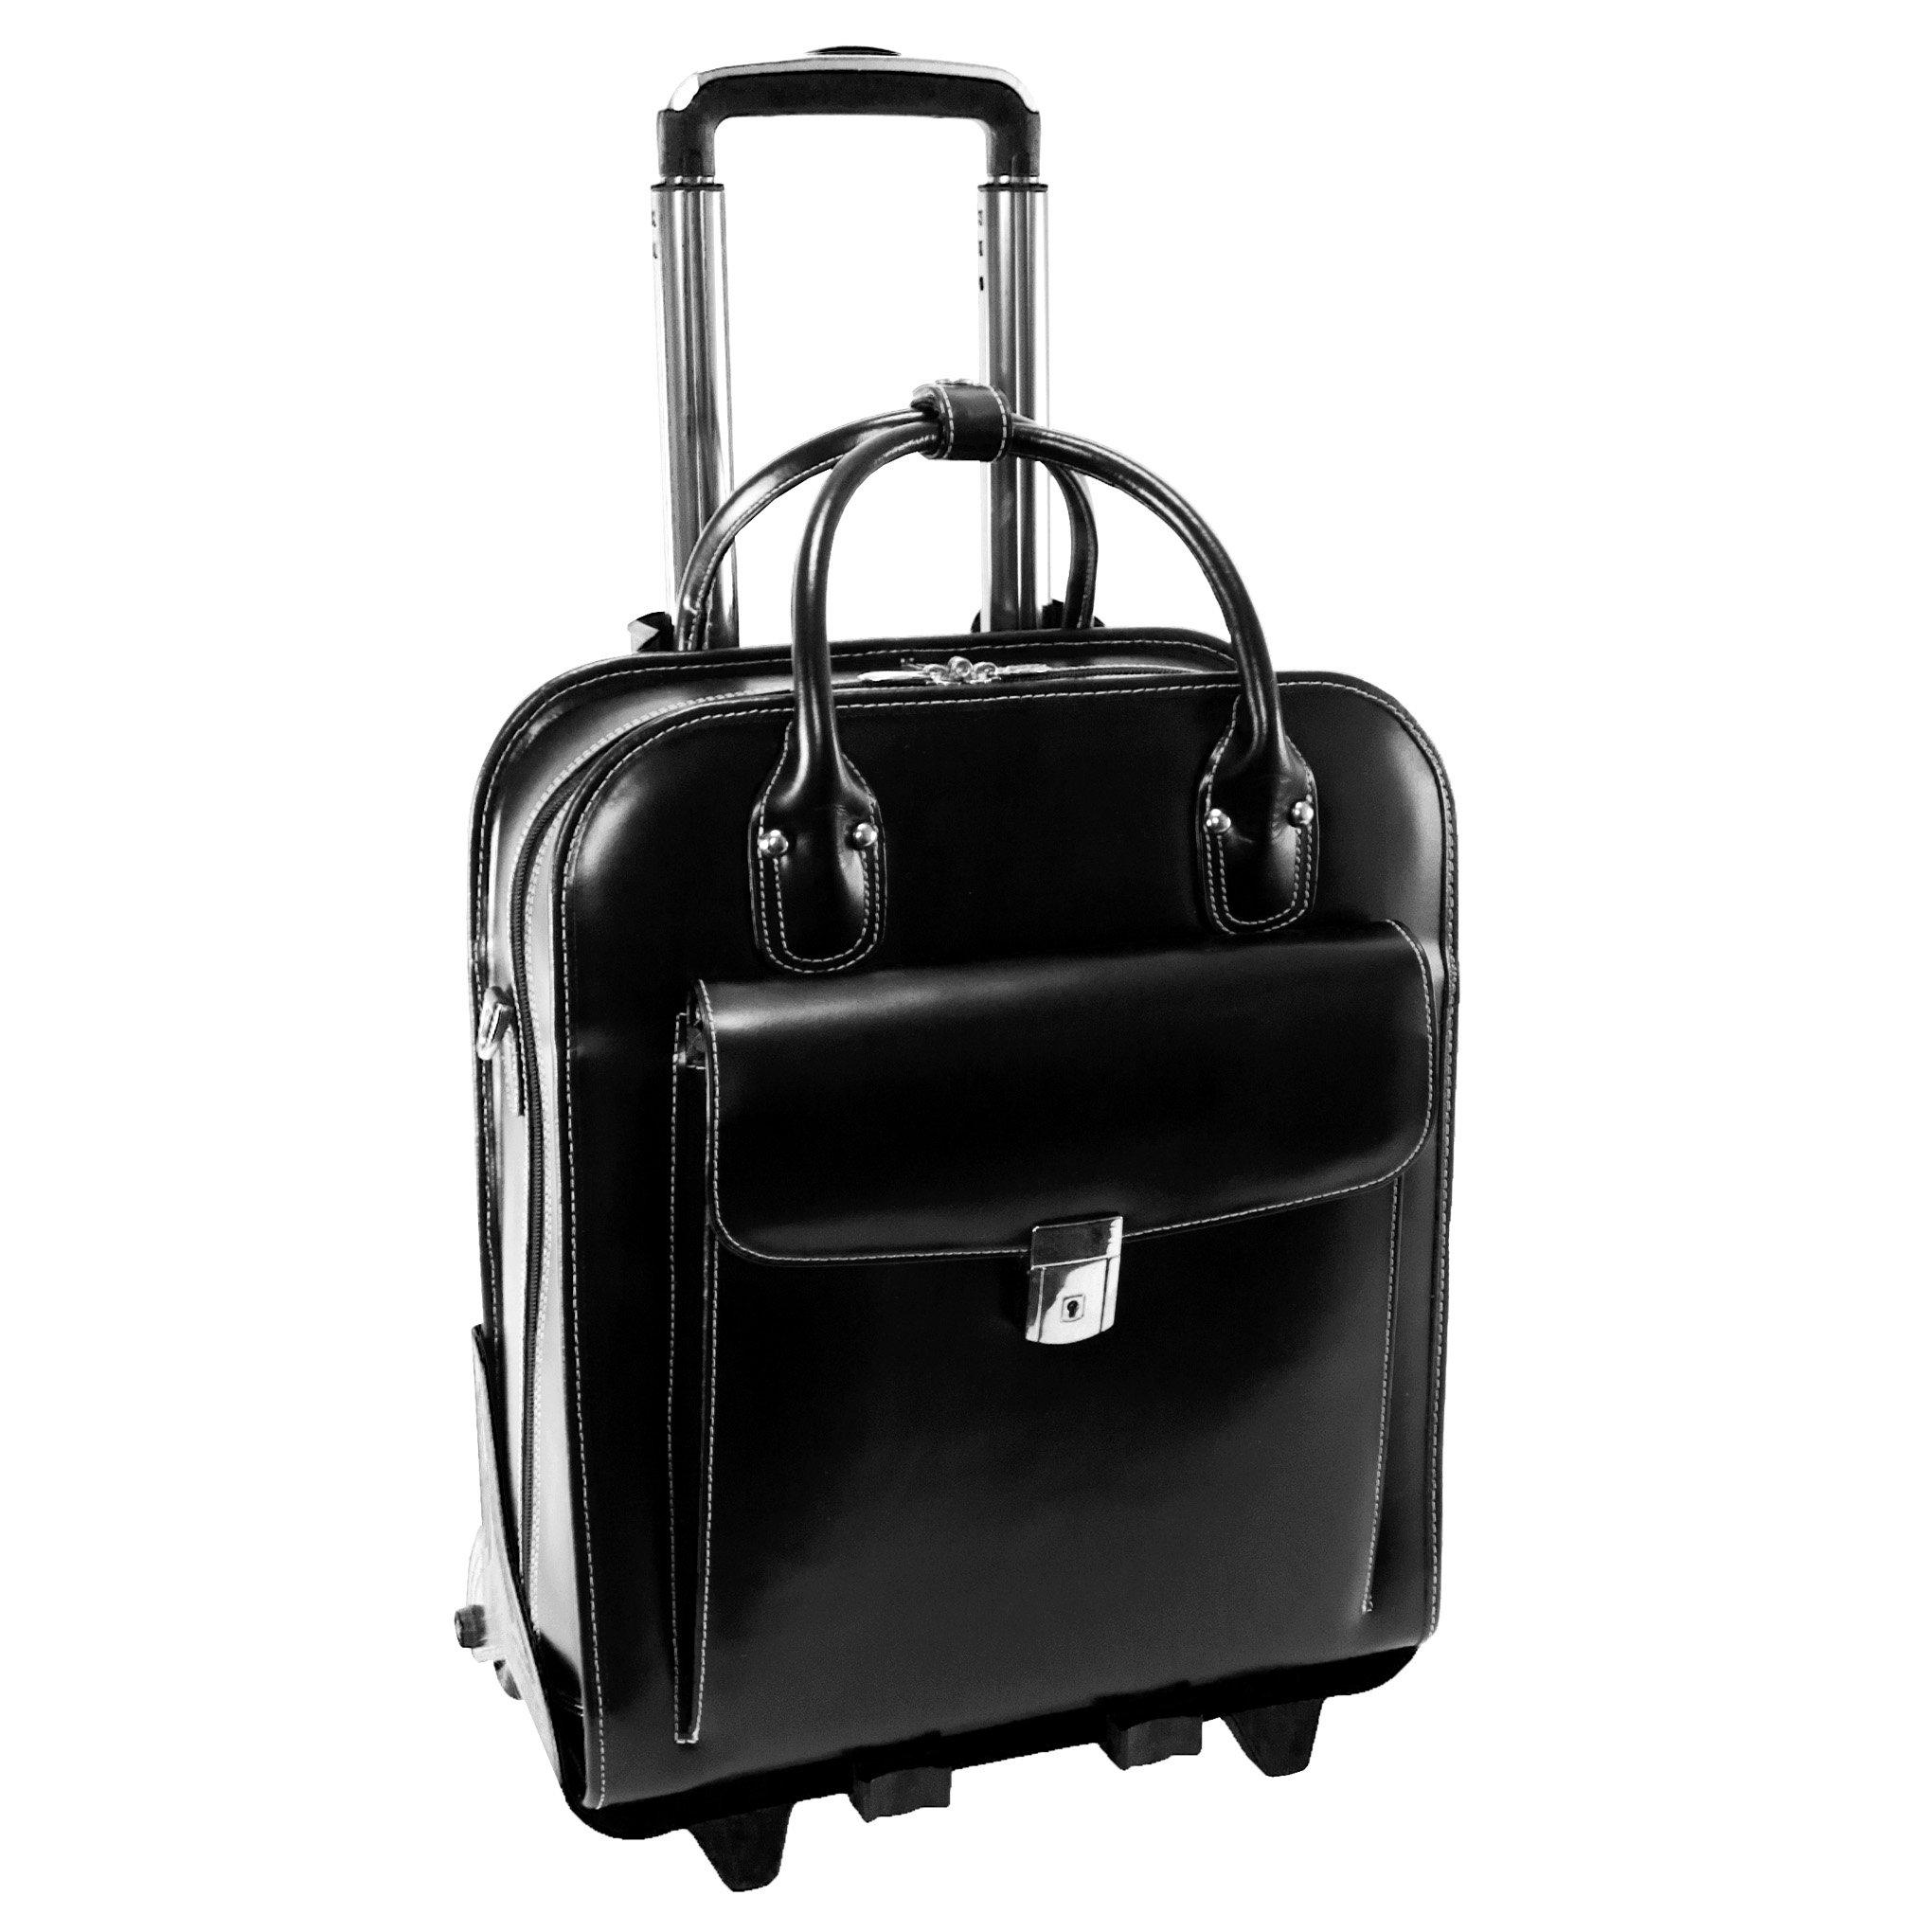 McKleinUSA LA GRANGE 96495 Black Leather Vertical Detachable-Wheeled Ladies' Briefcase by McKleinUSA